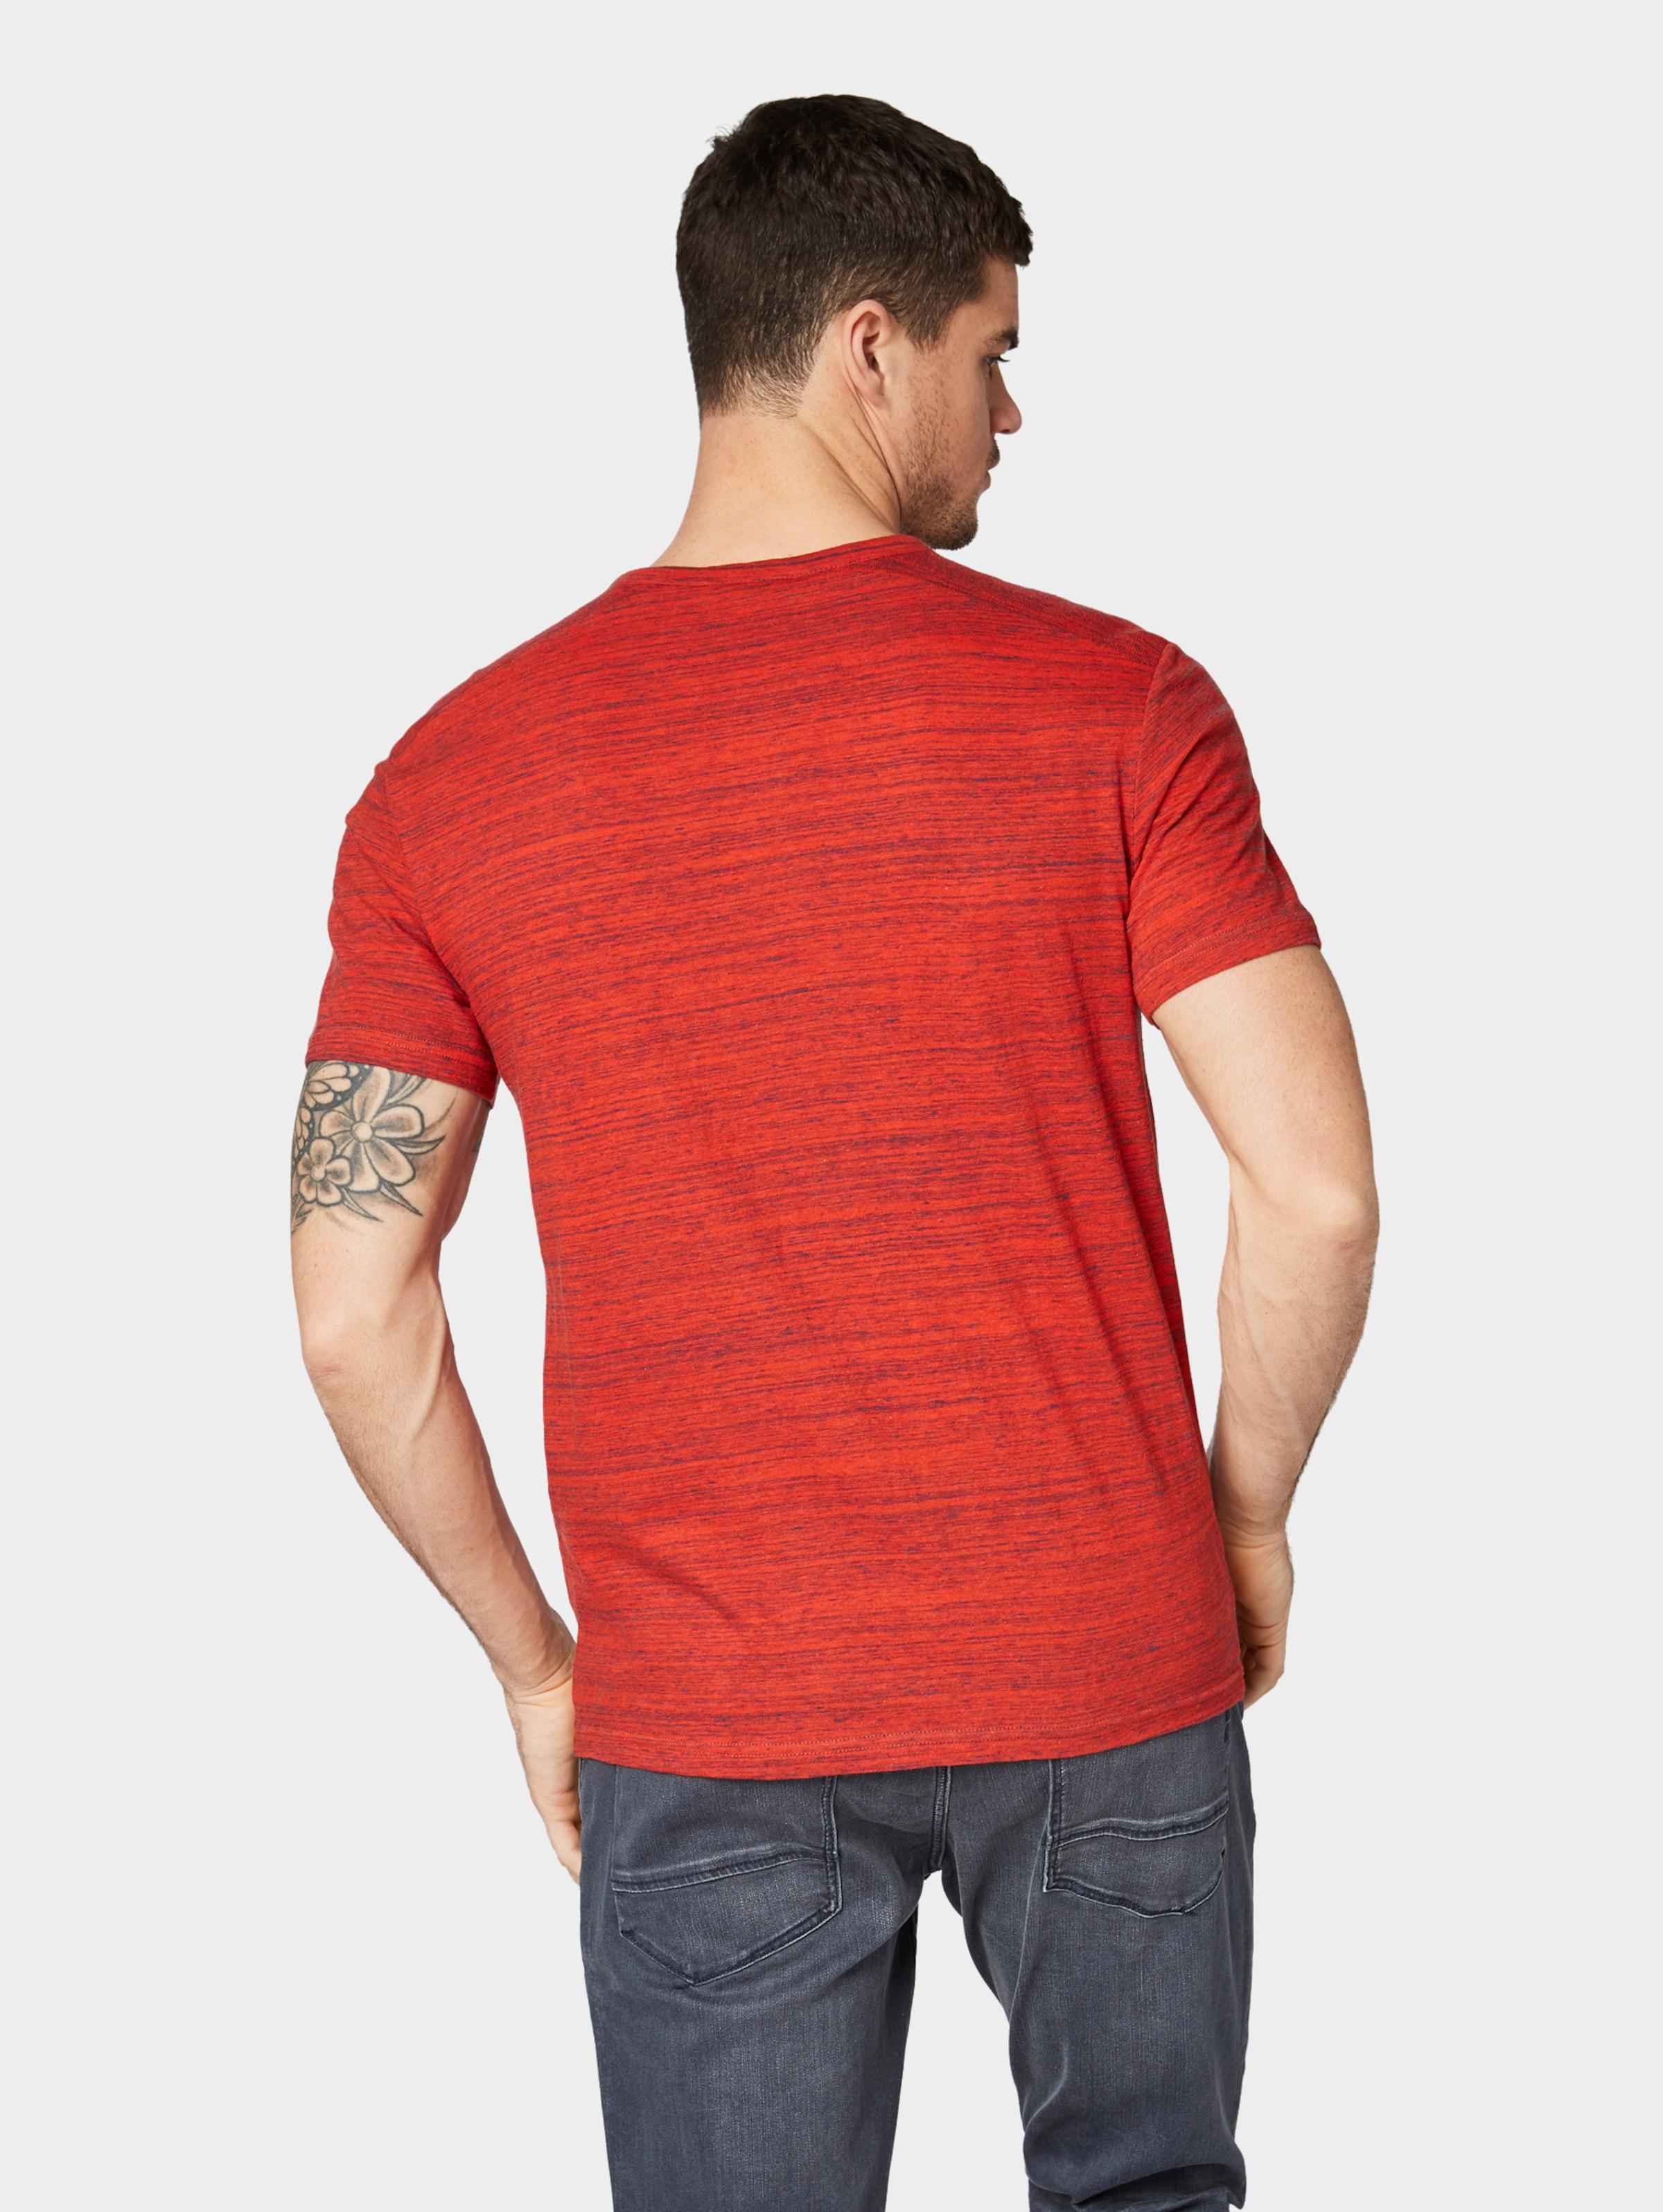 Tailor shirt Tom RotSchwarz T In f7gv6Yby